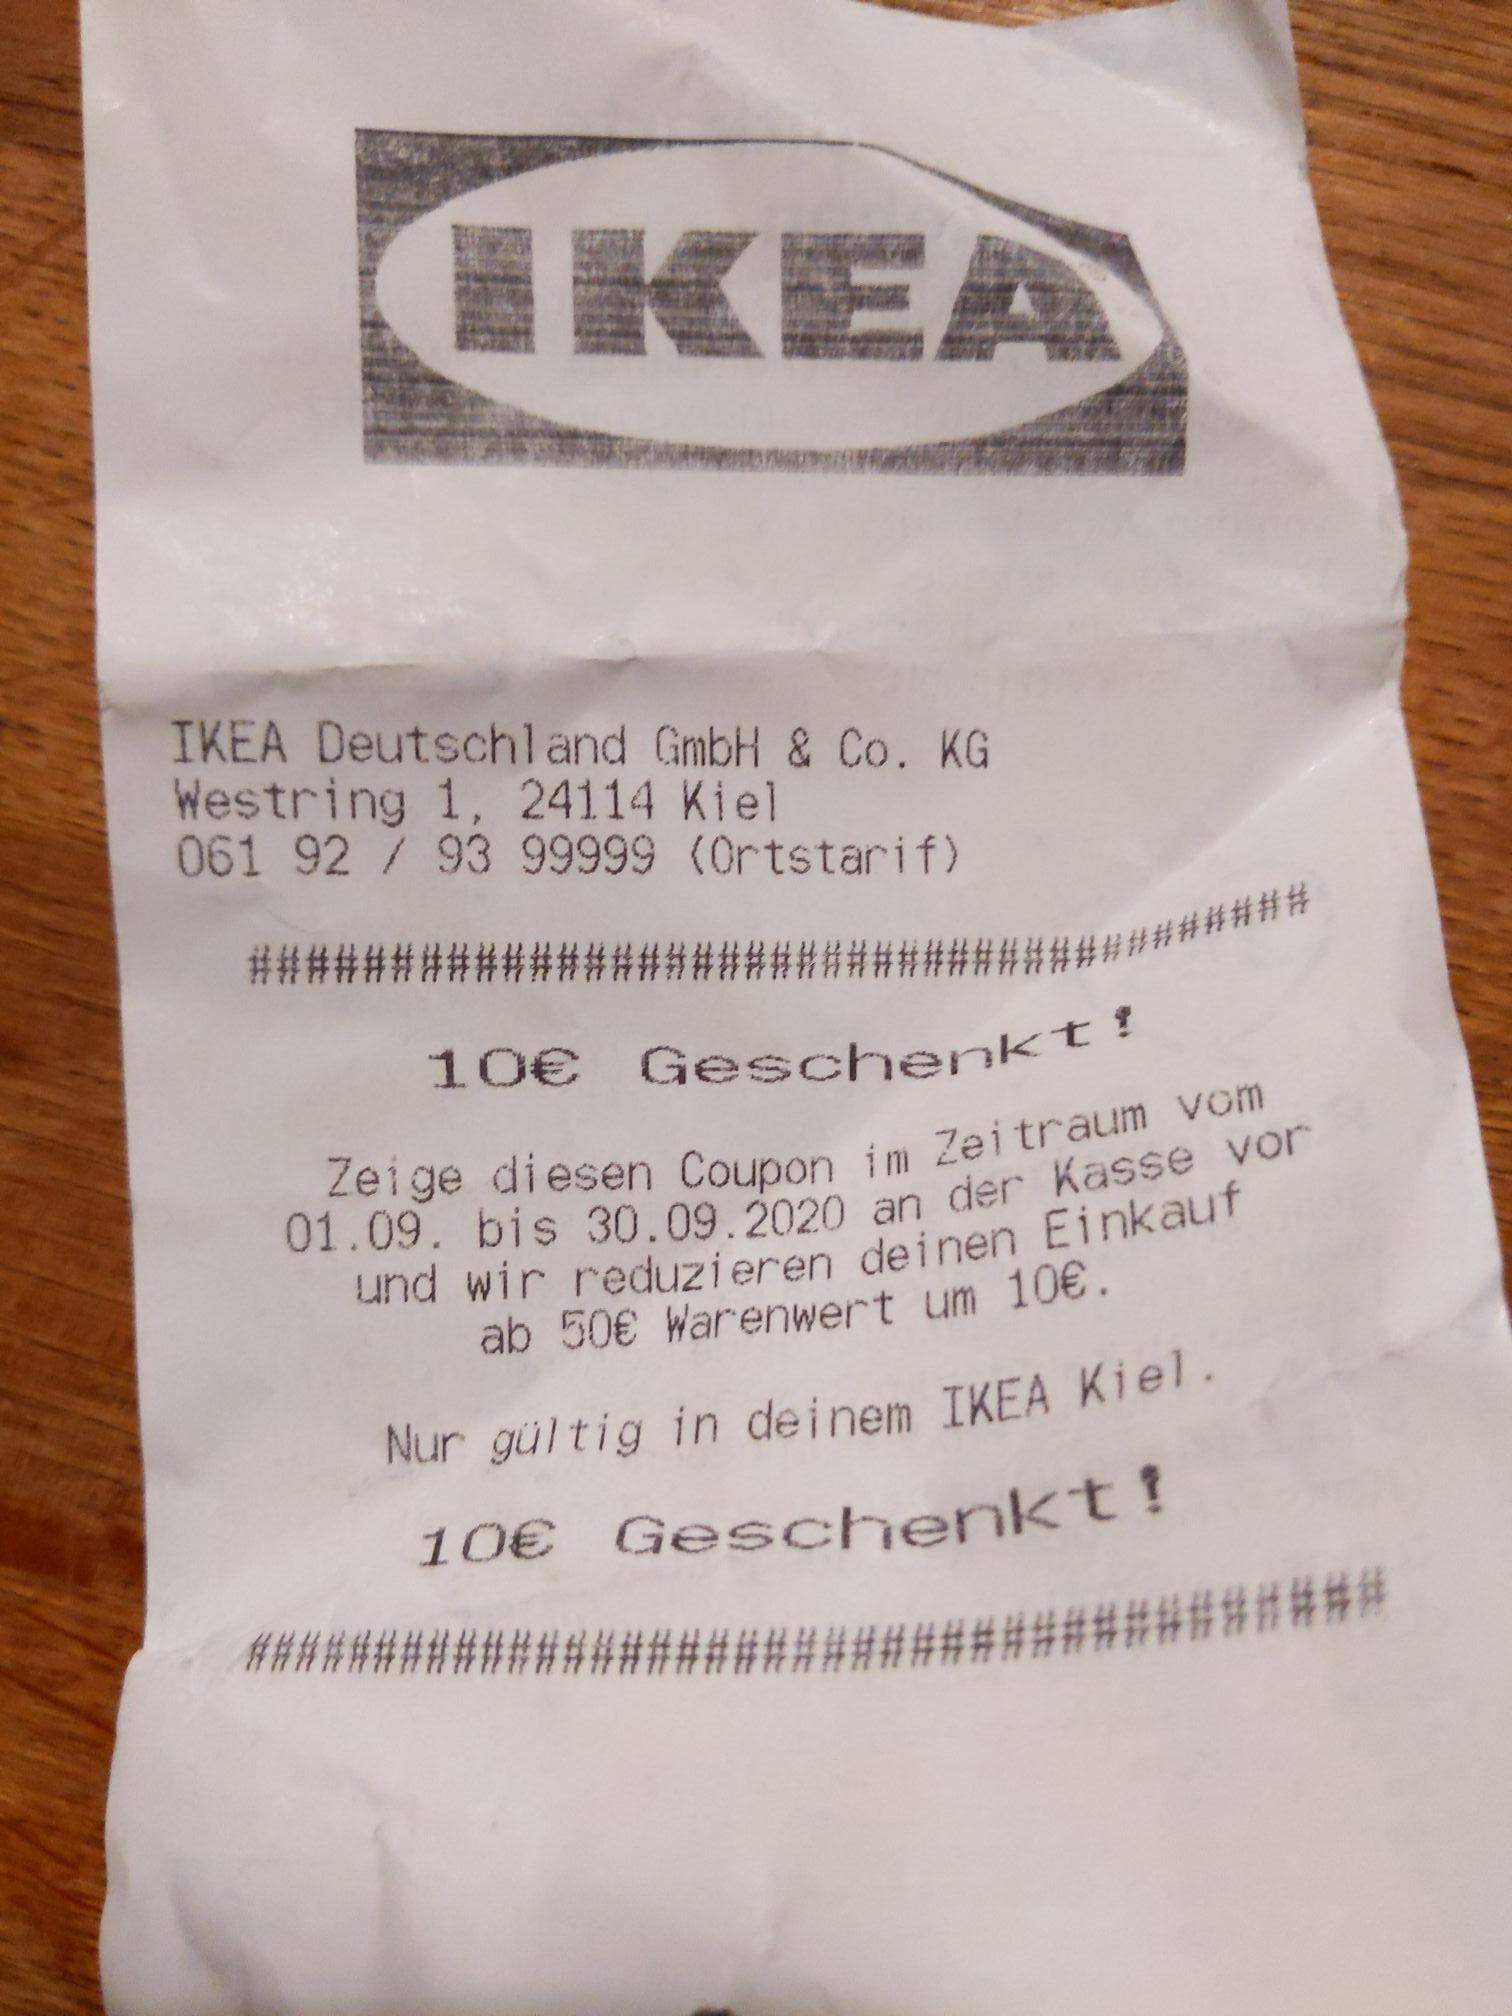 Lokal - Ikea Kiel/Hamburg Altona Coupon 10€ ab 50€ Warenwert im September